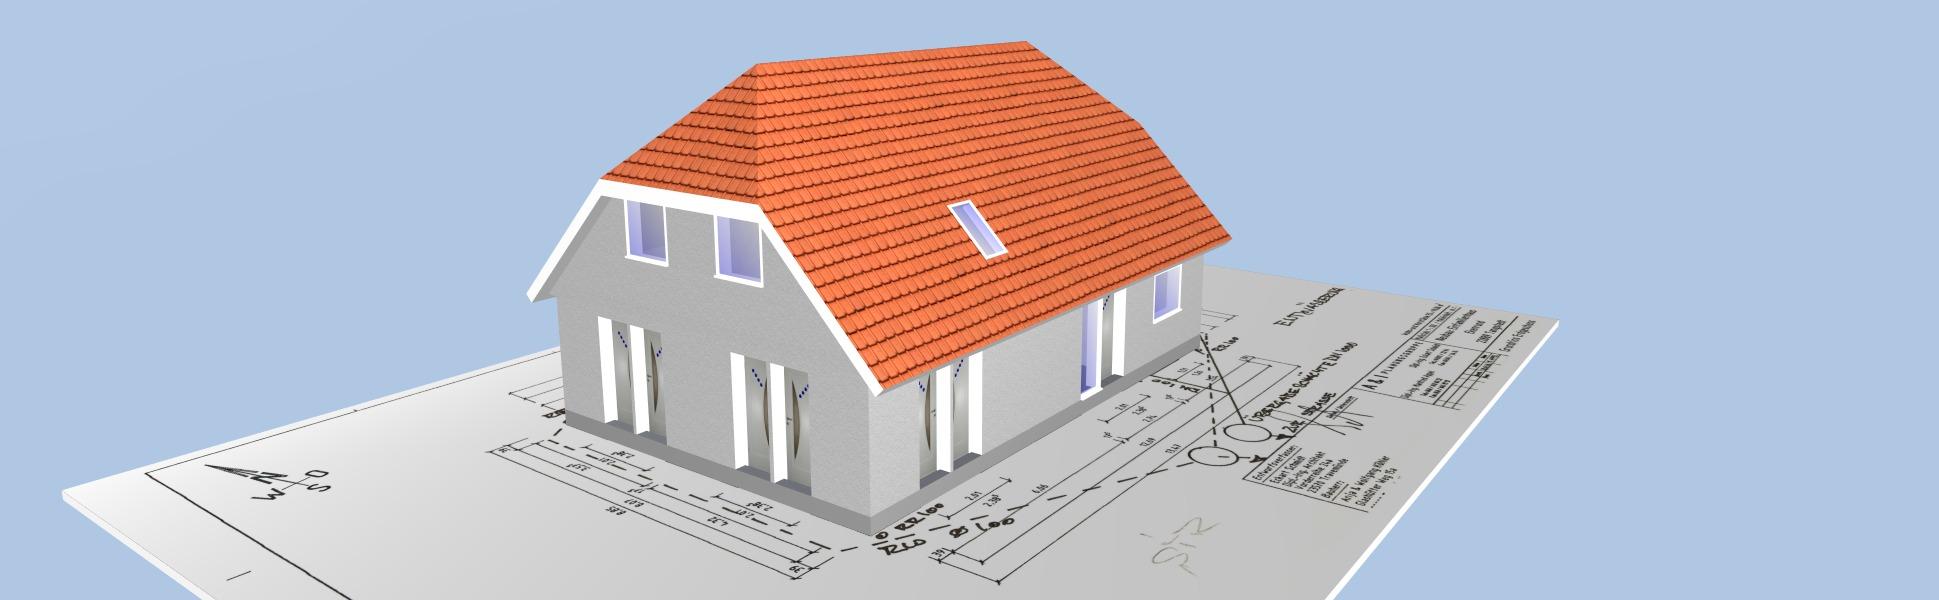 INFENSA-Energieberatung-CAD